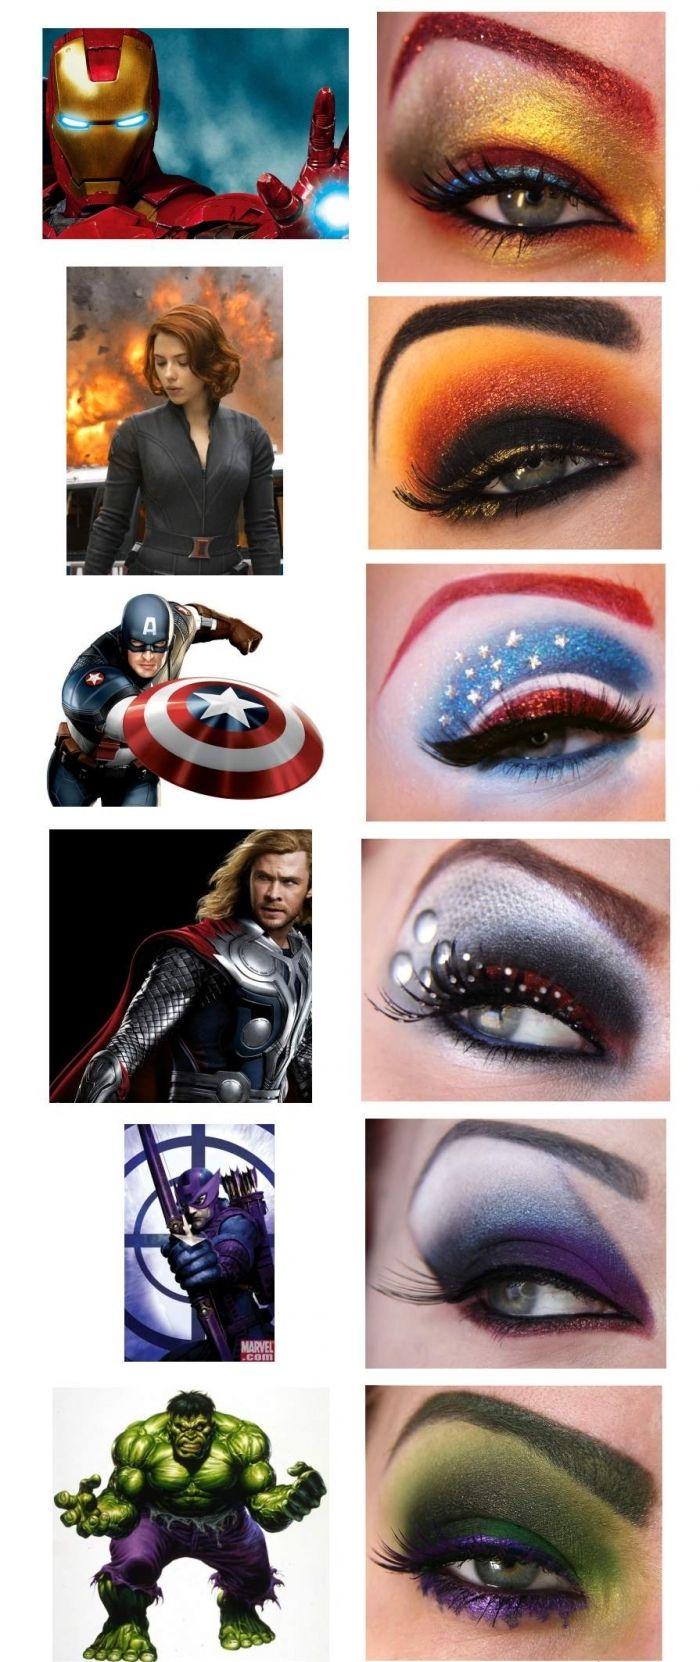 Avenger eye make up!! Just so you know how it goes.: Eye Makeup, Eye Shadows, Makeup Ideas, Eyemakeup, Super Heroes, Eyeshadows, Makeup Design, Superhero, The Avengers